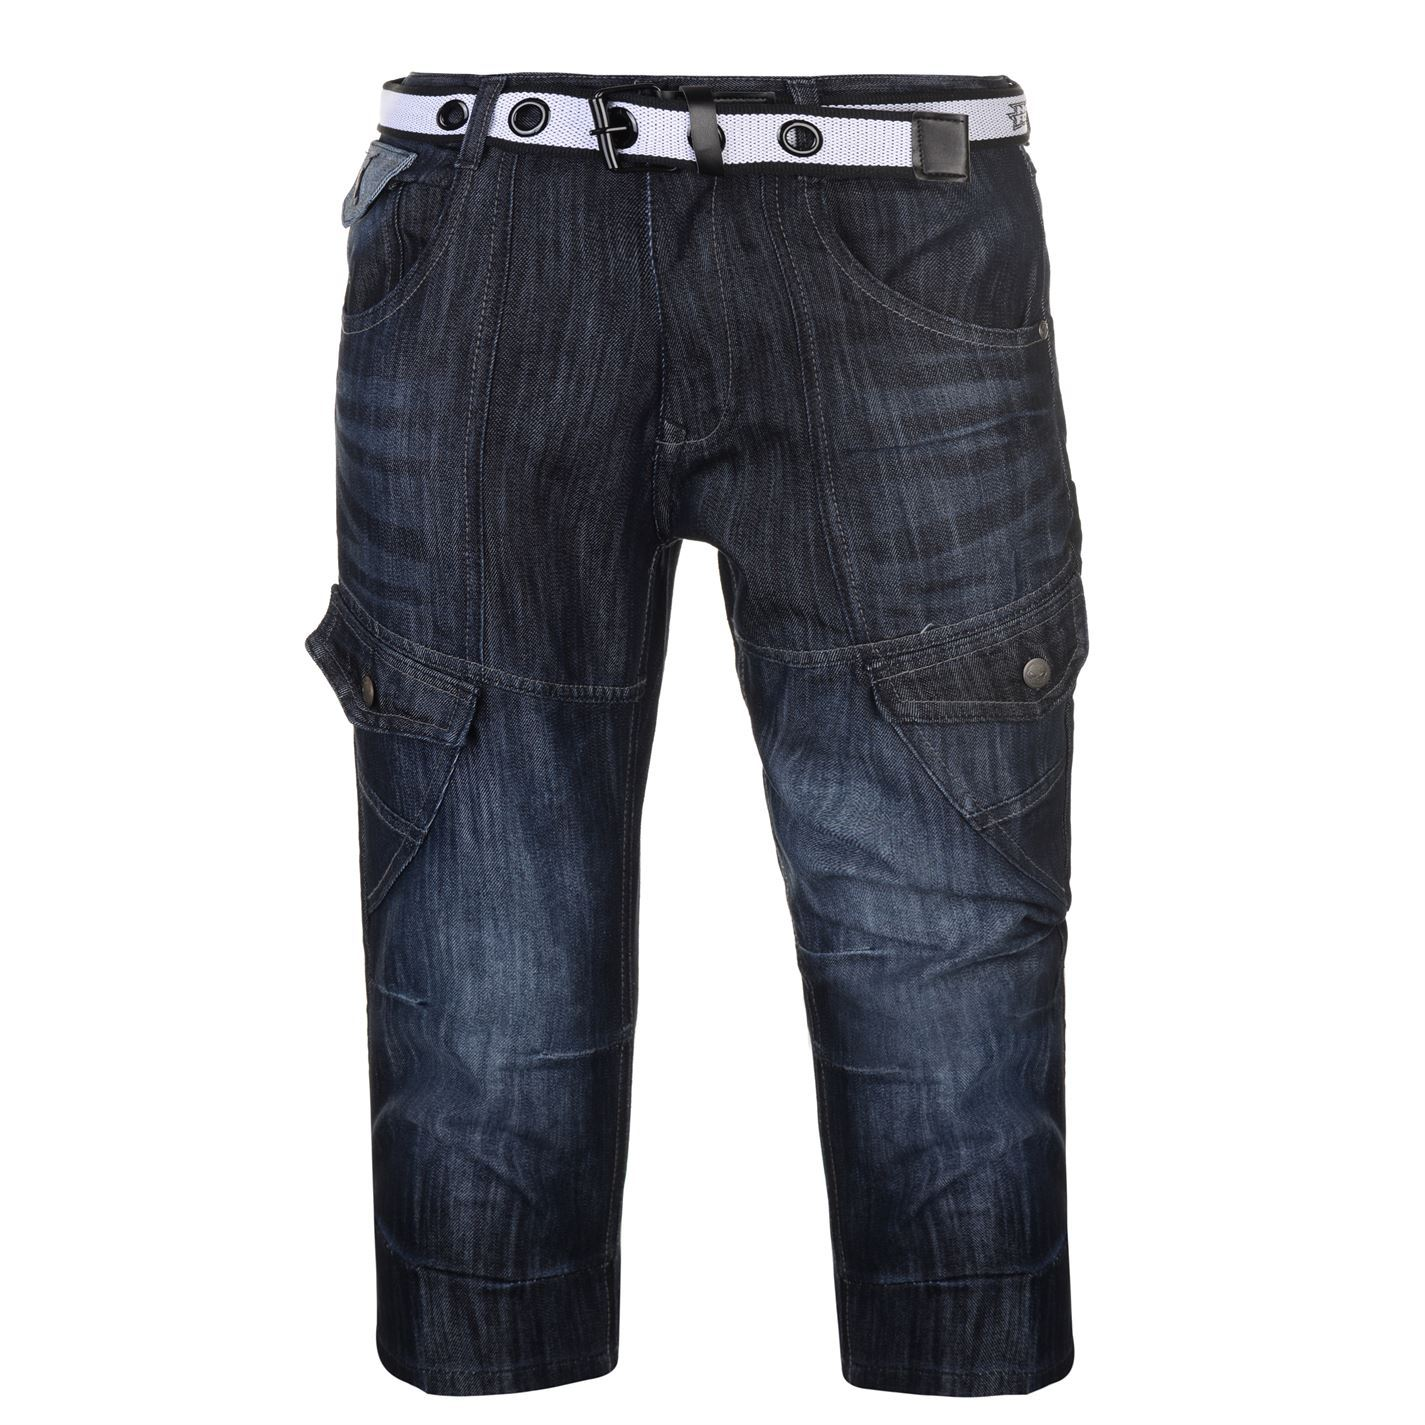 No-Fear-Belted-Cargo-Shorts-Mens-Bottoms-Short-Pants-Summerwear thumbnail 5